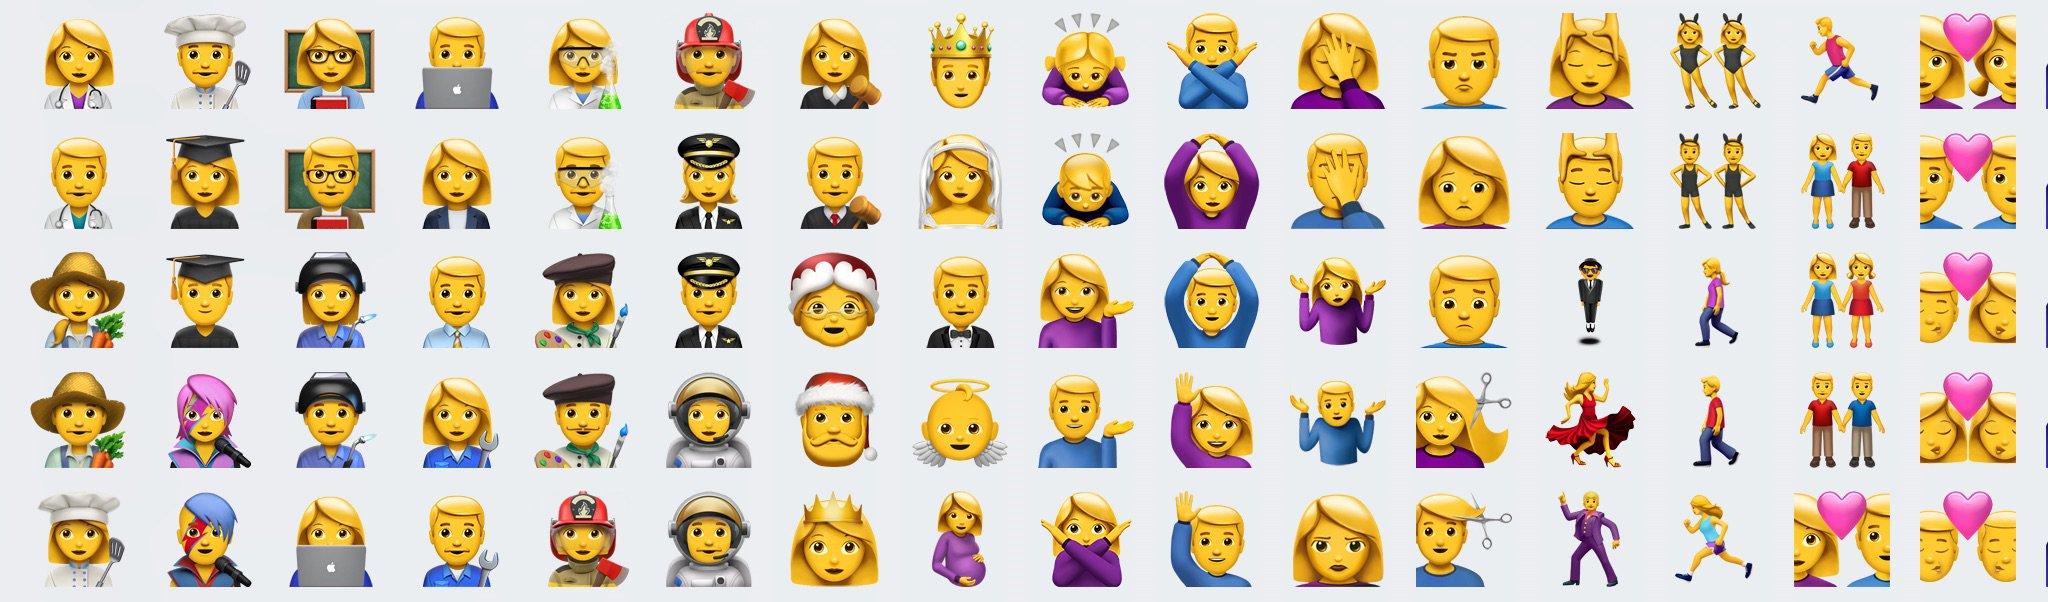 nuove-emoji-ios-10-2-2